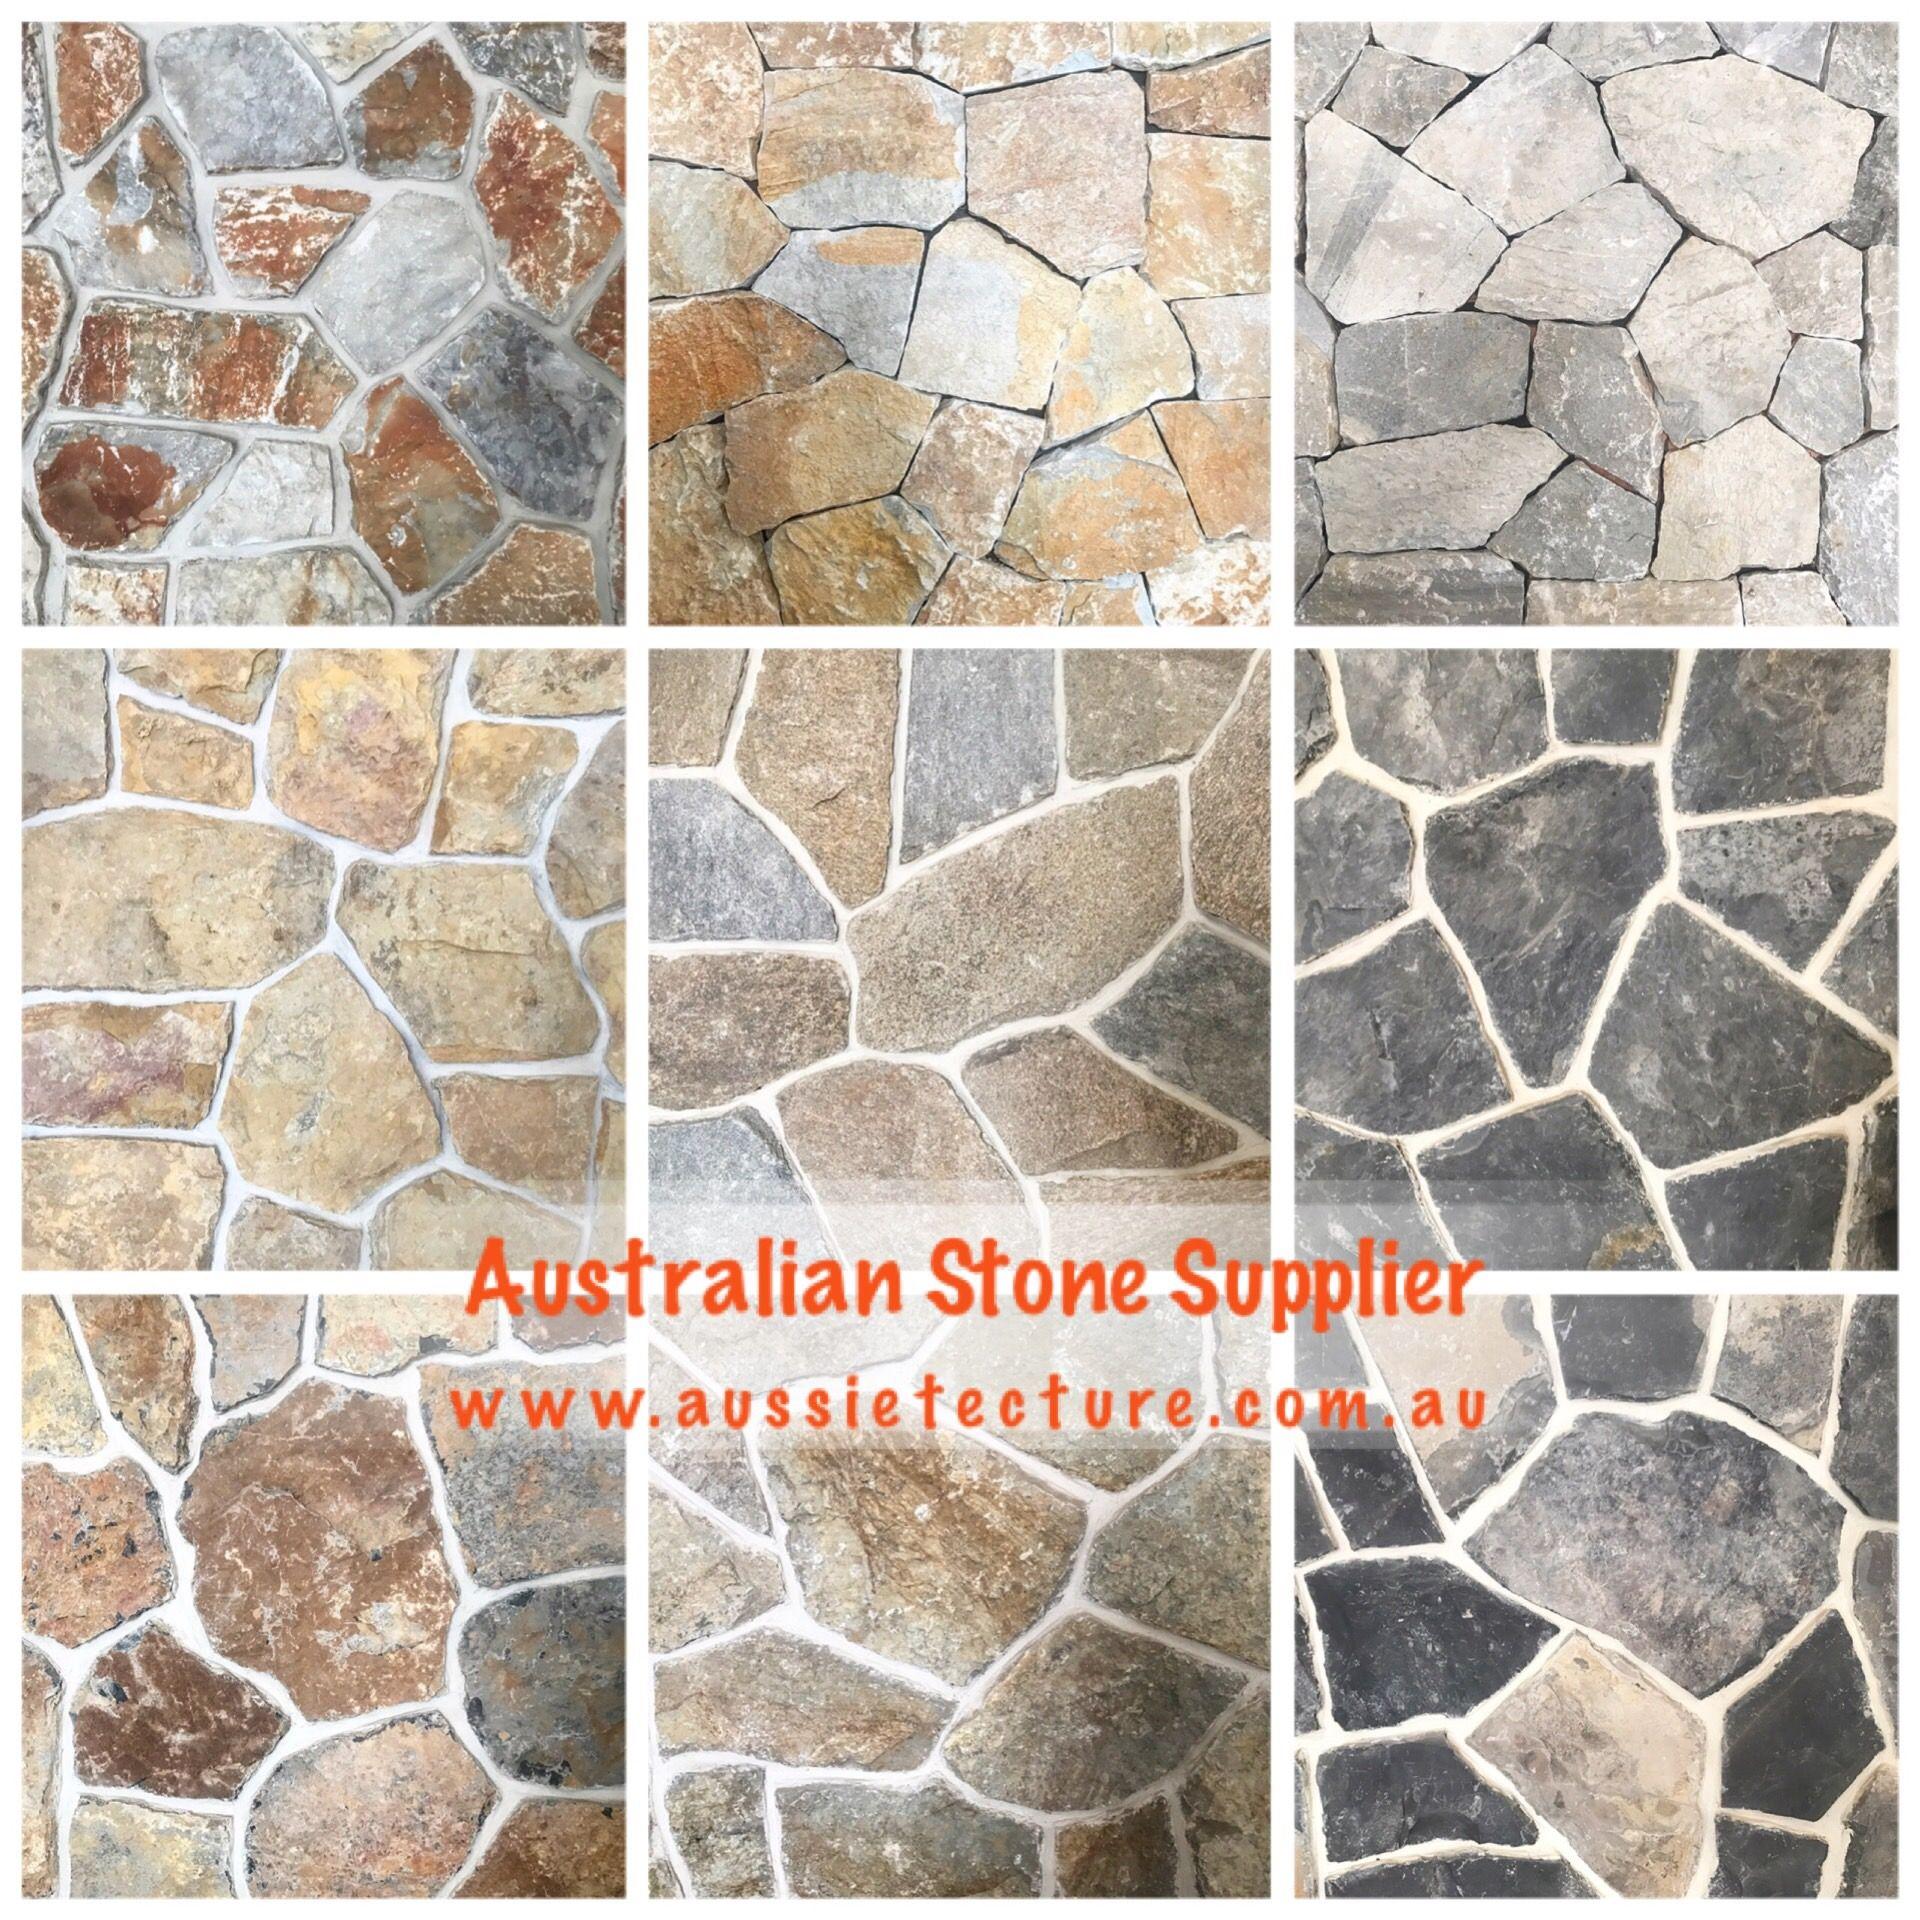 Stone Cladding Natural Stone Sone Wall Cladding Stone Wall Stone Walling Stone Walls Sandstone Stone Claddi Stone Cladding Exterior Design Wall Cladding